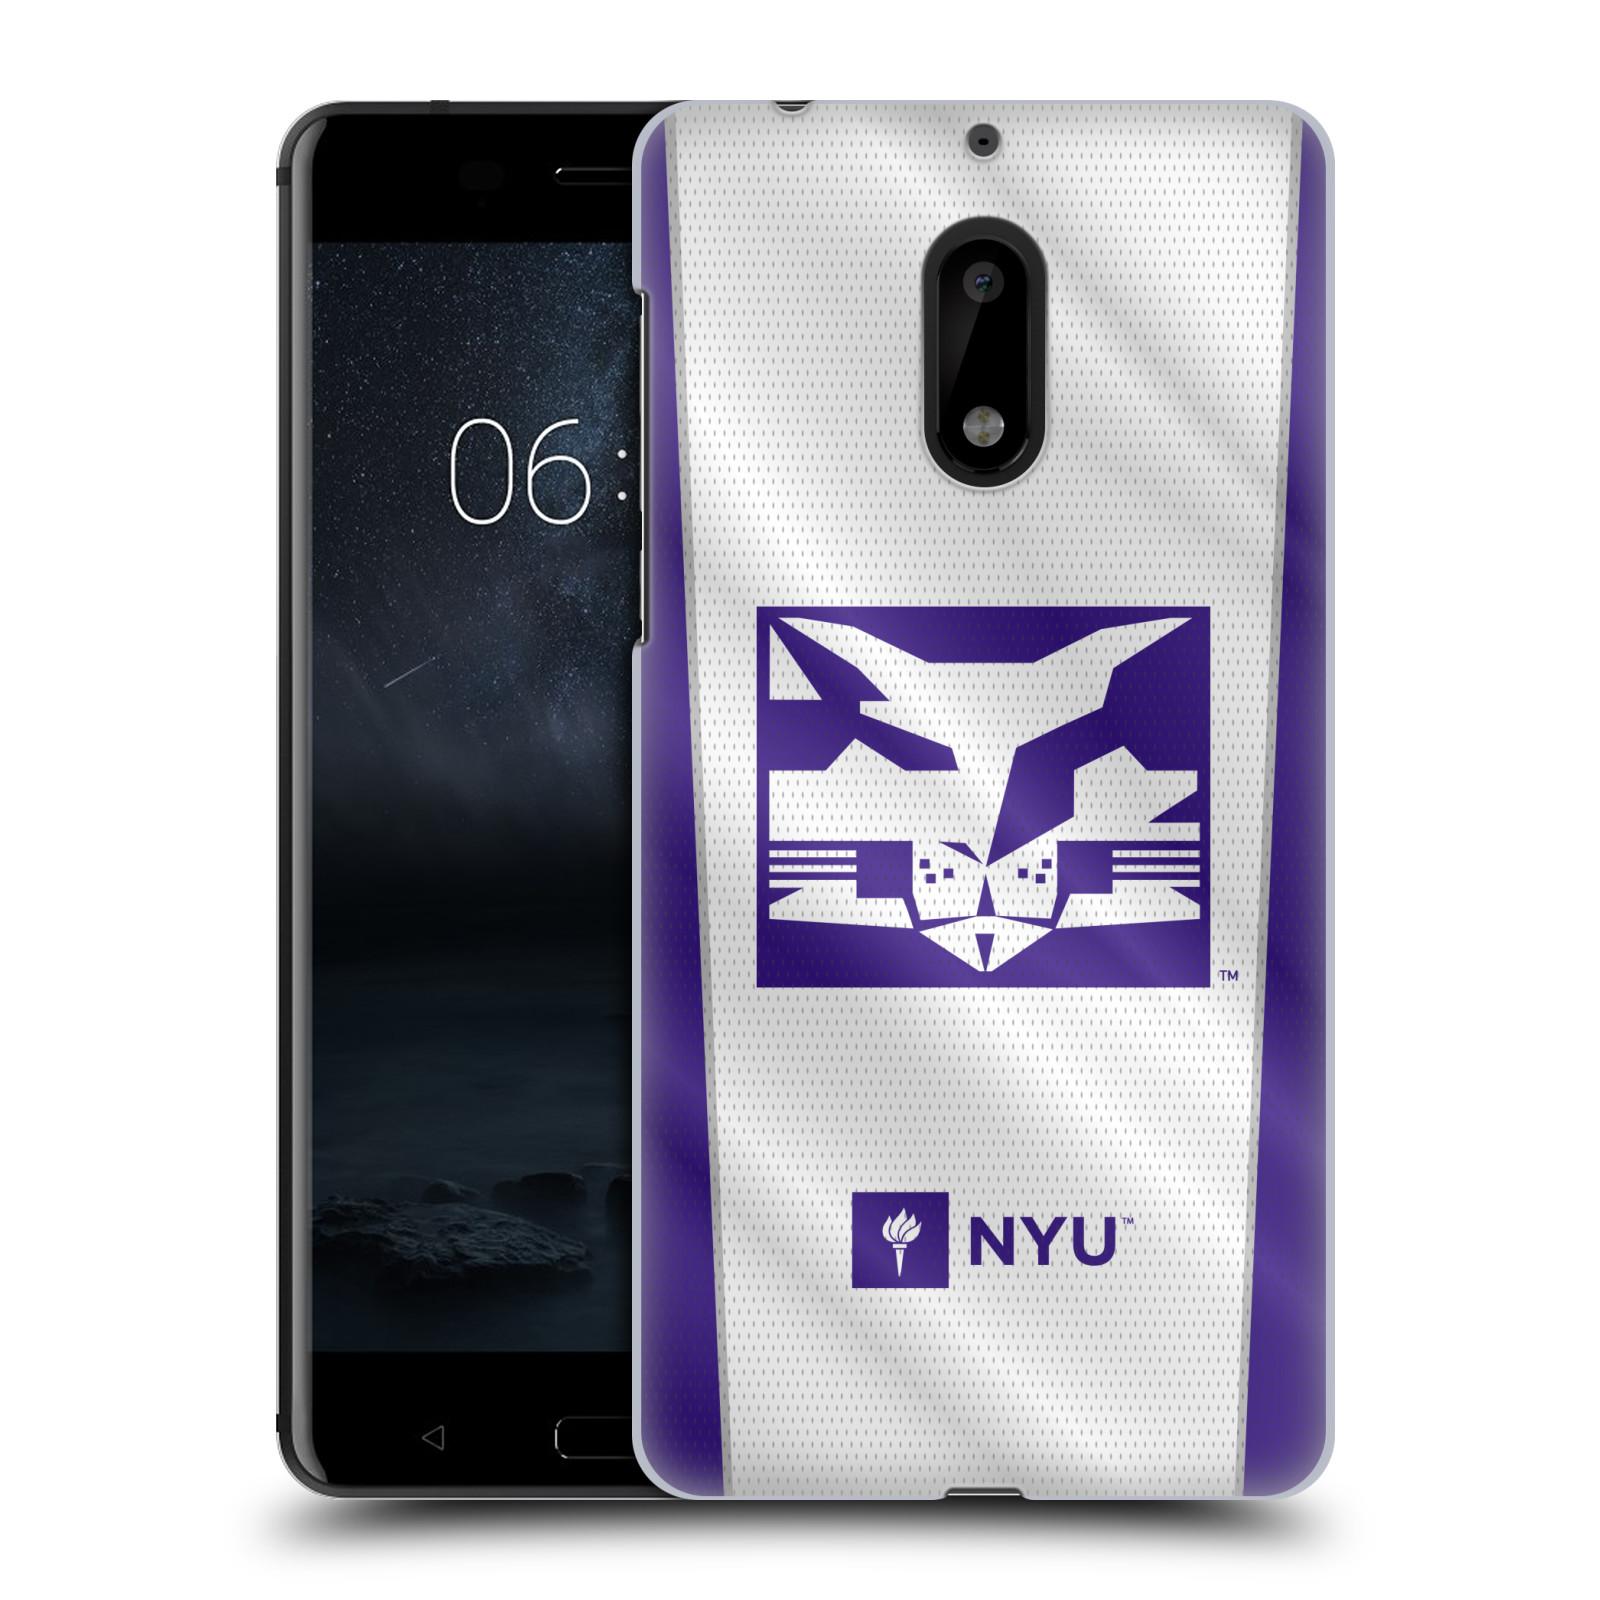 OFFICIAL-NEW-YORK-UNIVERSITY-NYU-HARD-BACK-CASE-FOR-NOKIA-PHONES-1